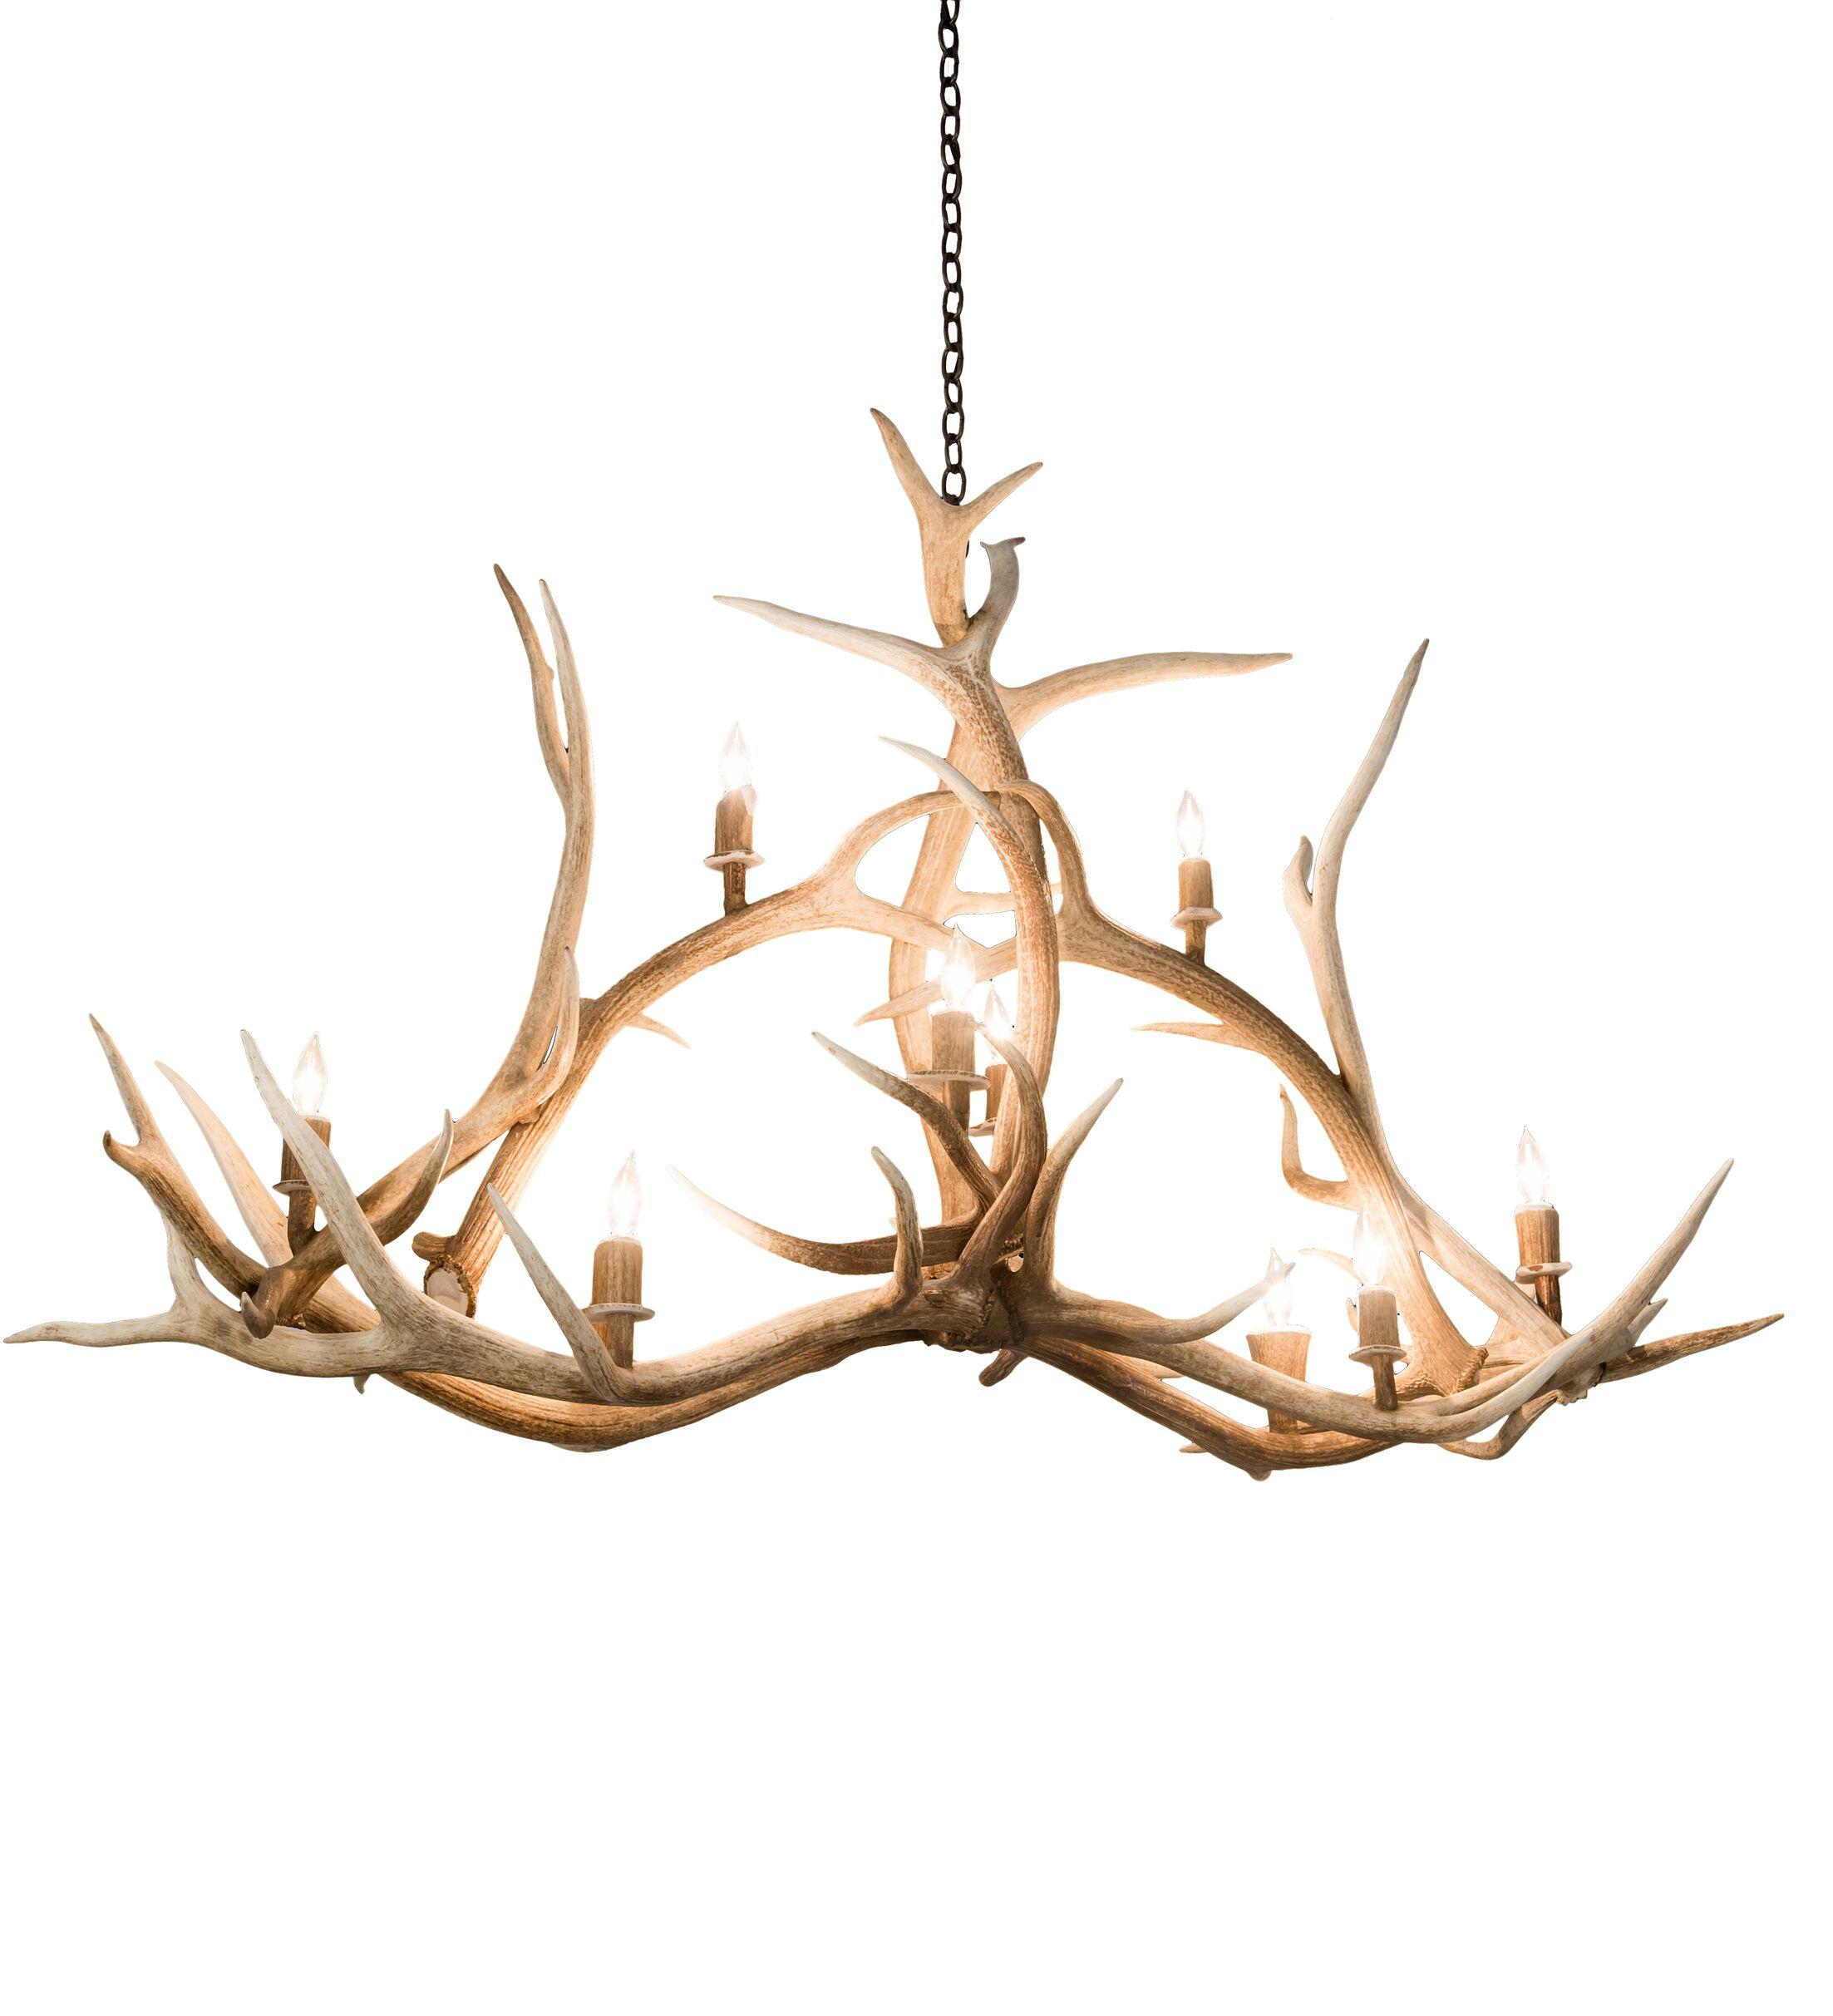 Scruggs Elk Oblong 10-Light Novelty Chandelier